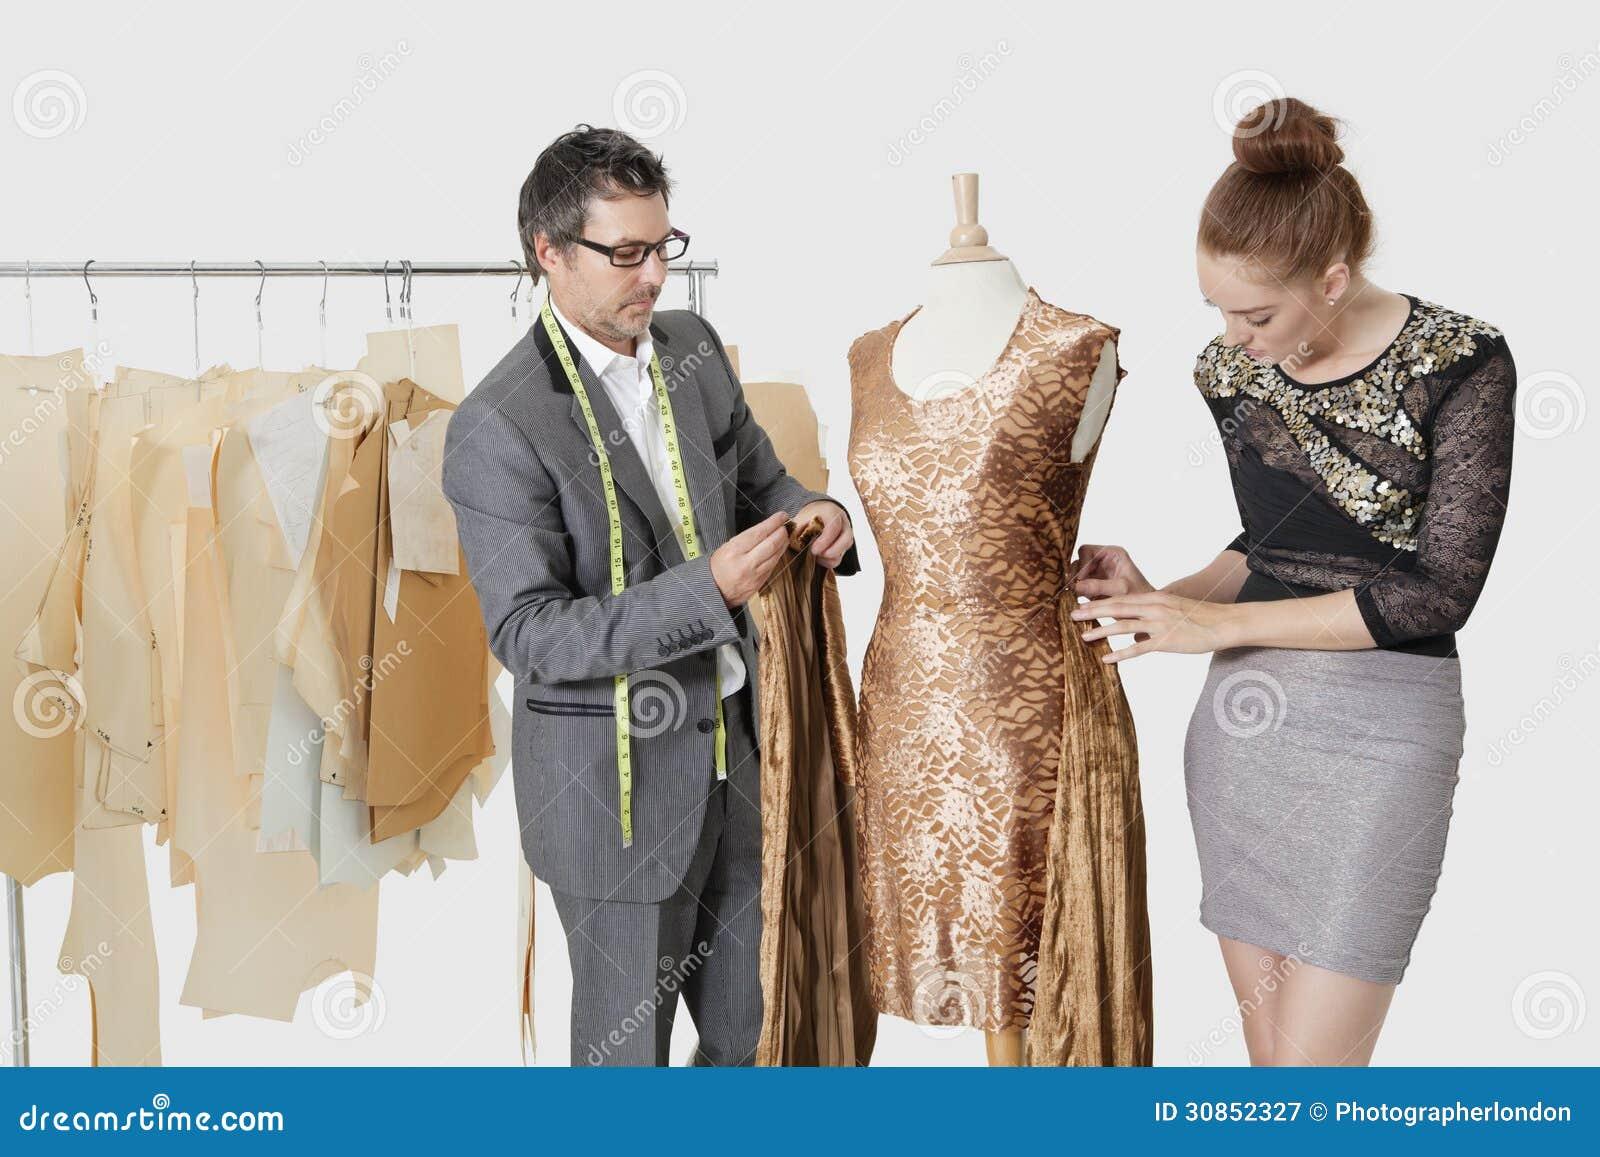 Fashion Designers Industries